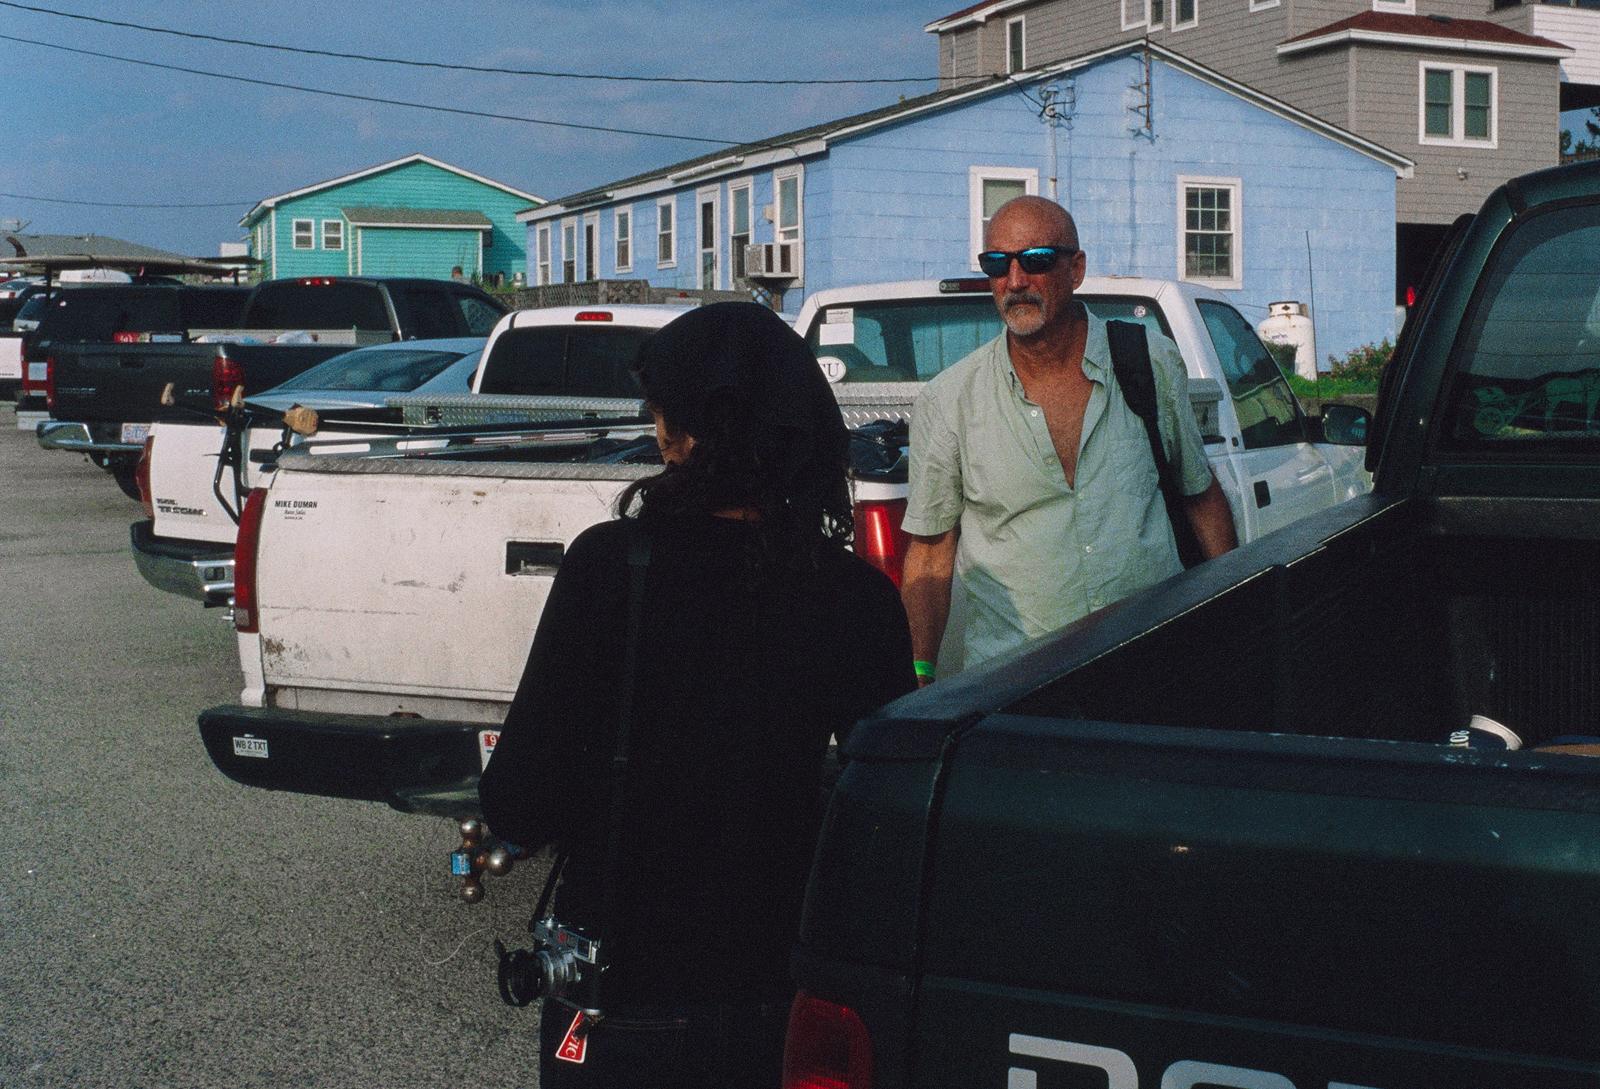 David Alan Harvey, Outer Banks, NC, 2012. Photo by Jordan Weitzman